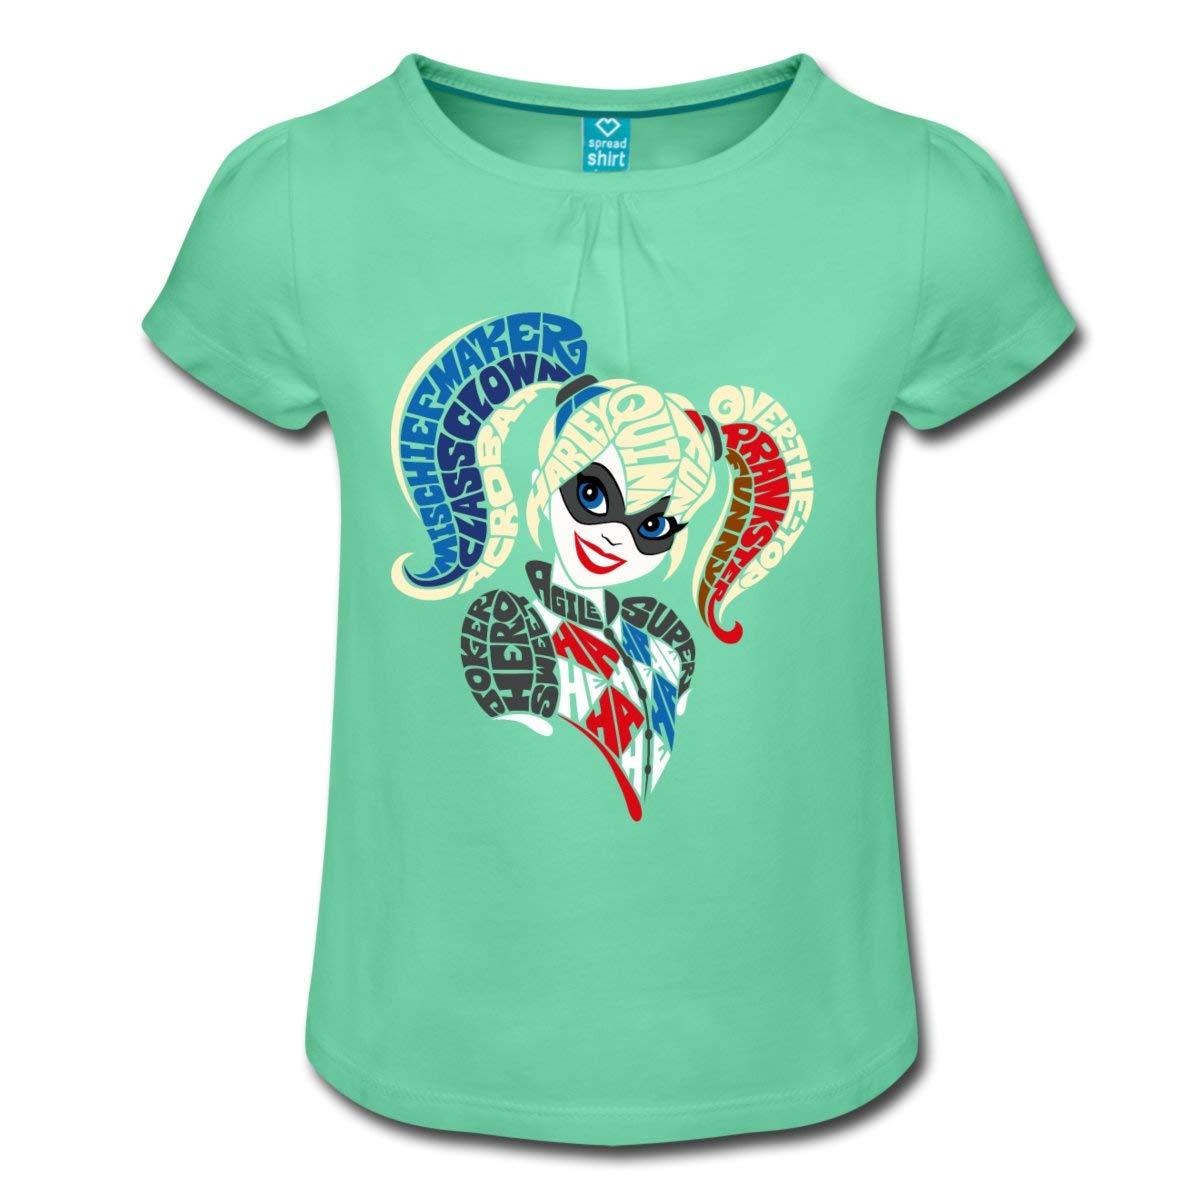 Spreadshirt DC Super Hero Girls Harley Quinn Typographie T-Shirt /à Fronces Fille